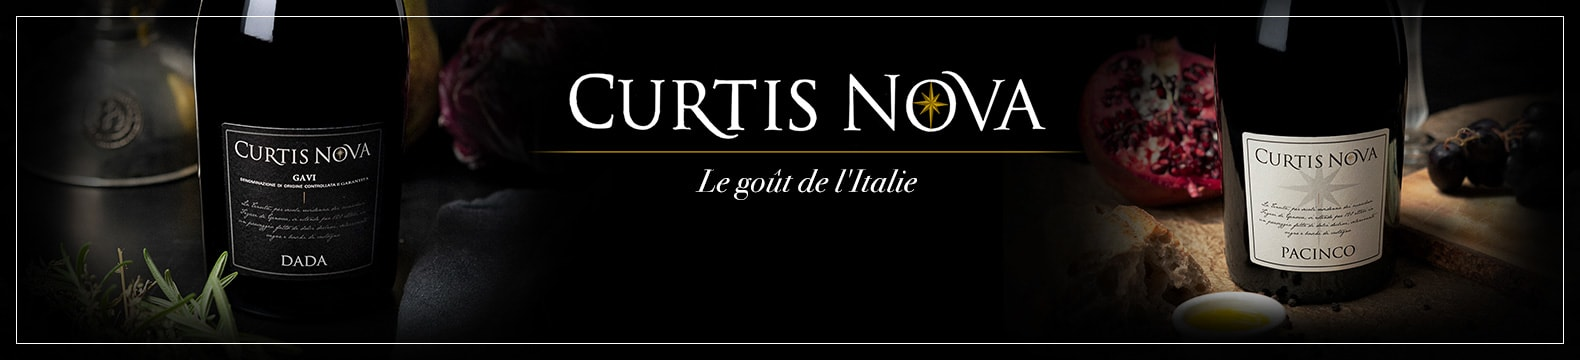 Carousel Banner Curtis Nova 1